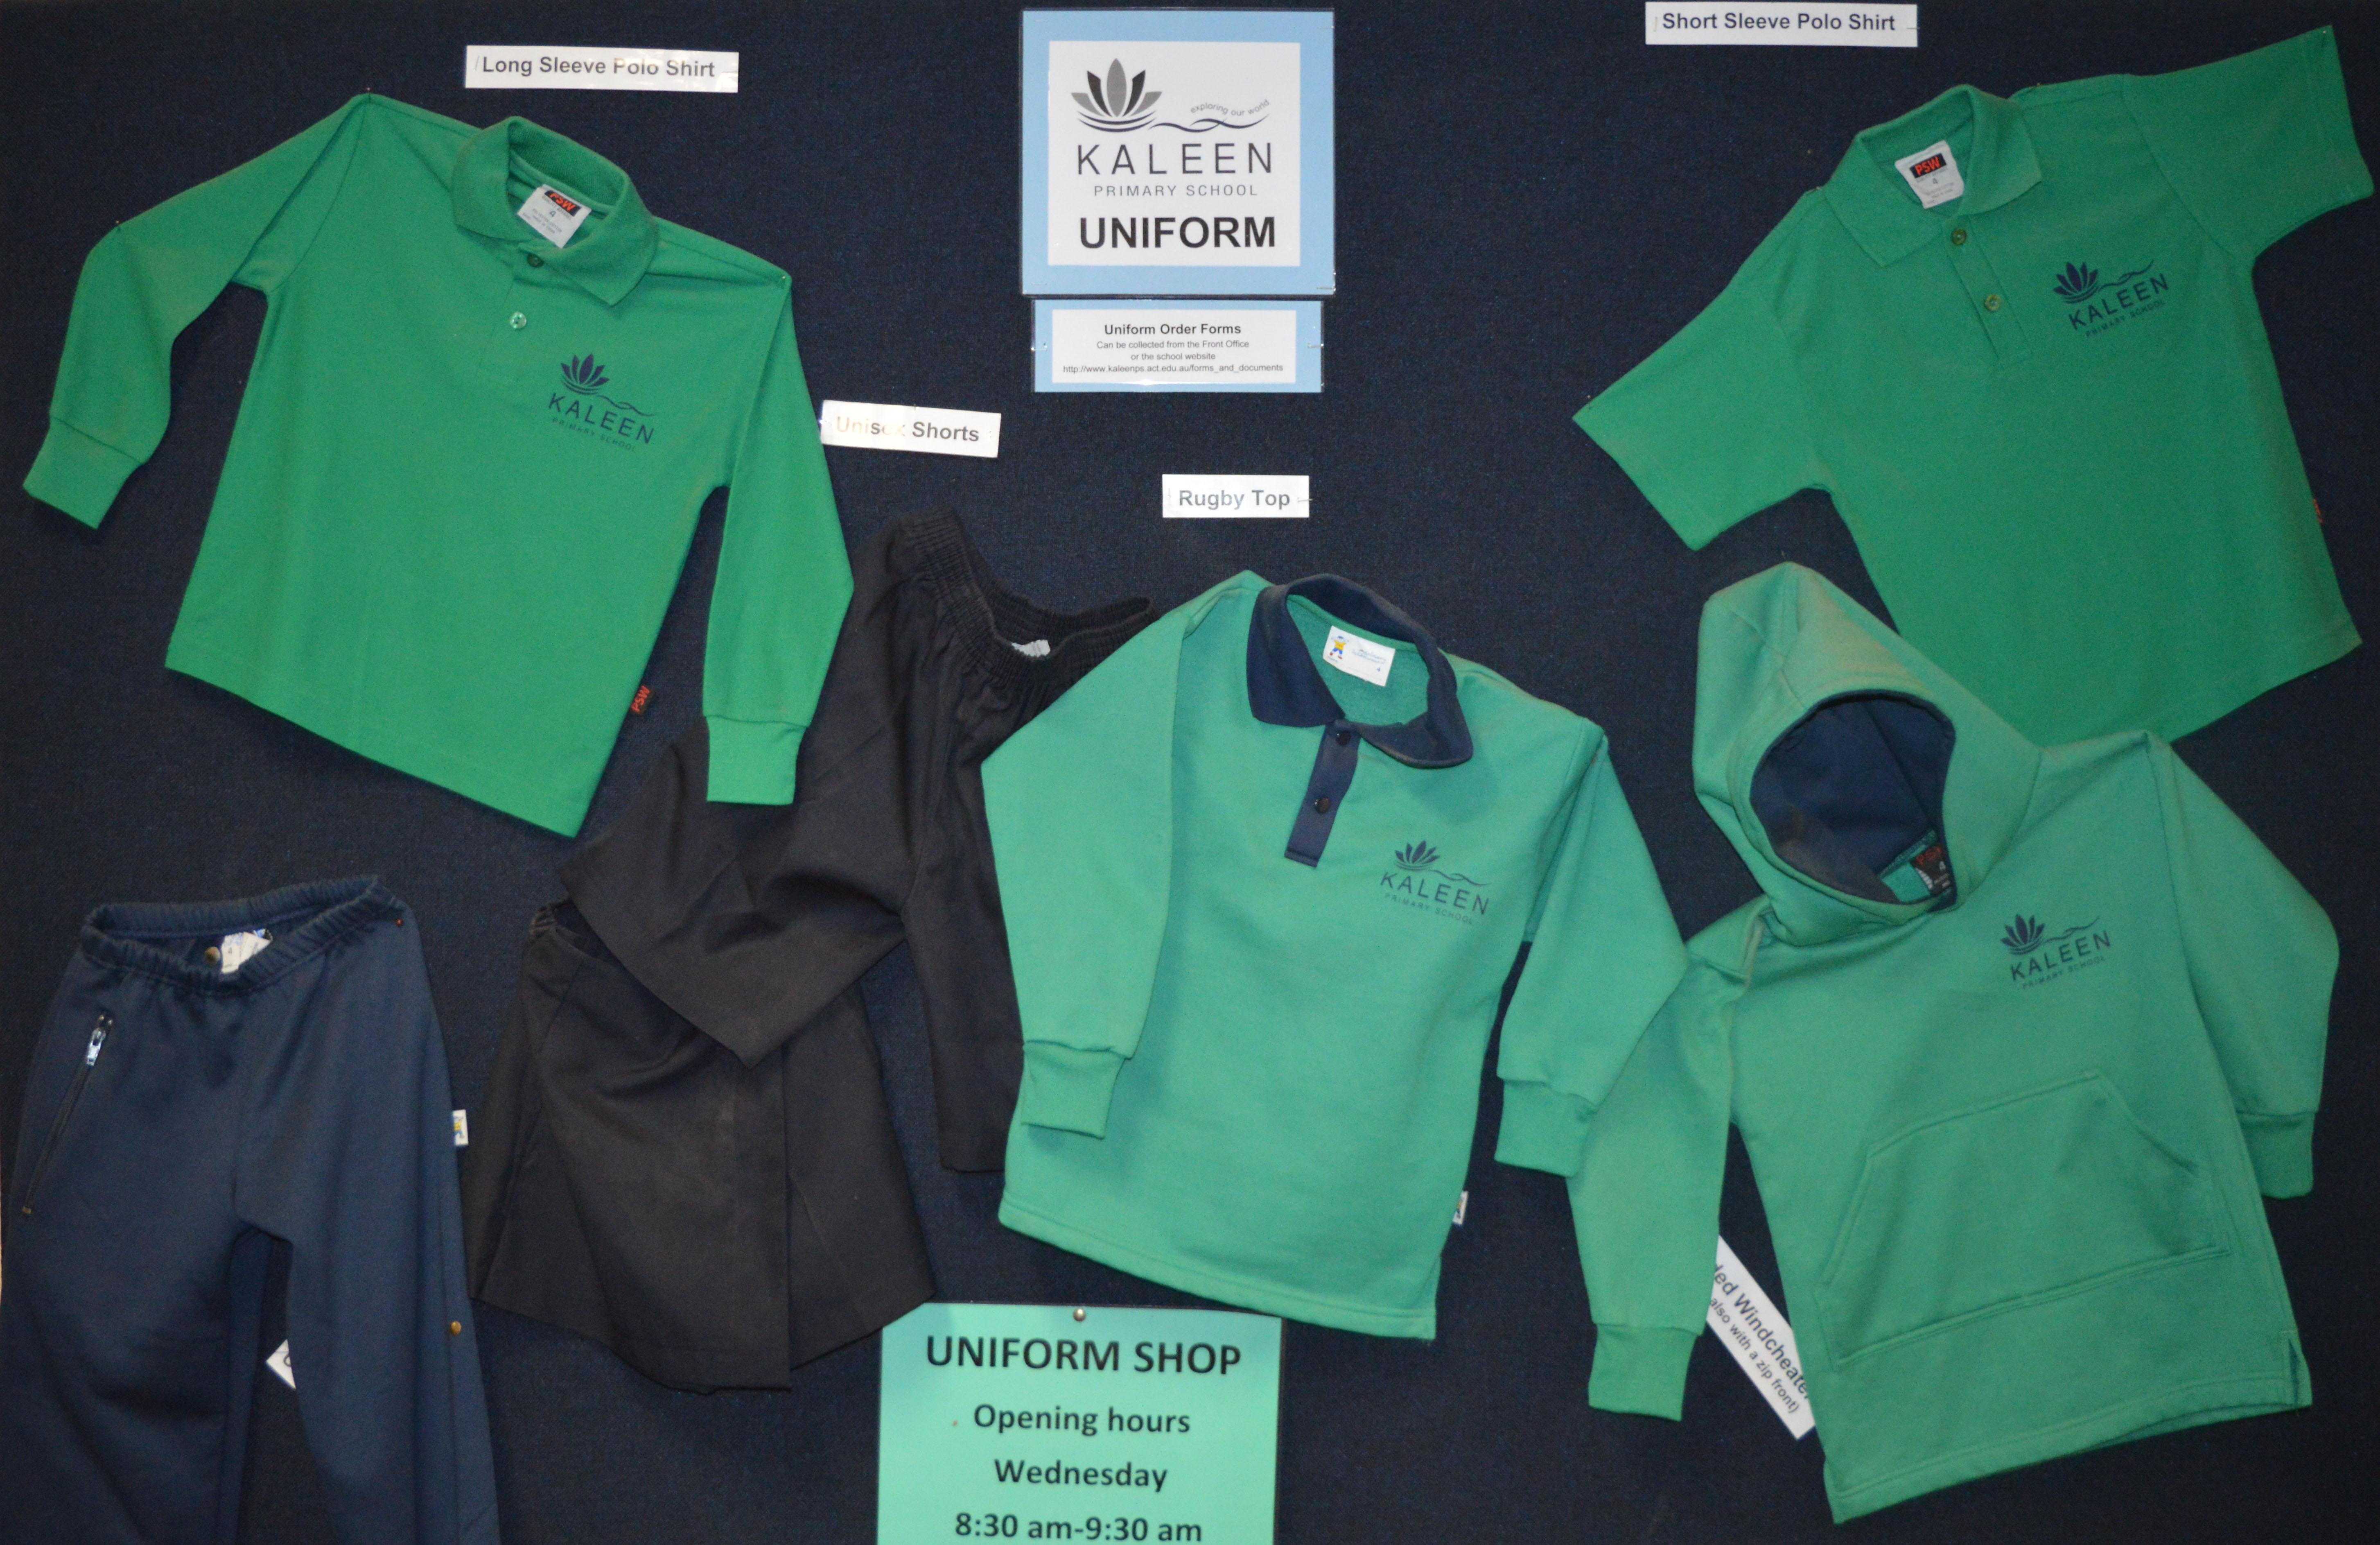 uniform shop 2